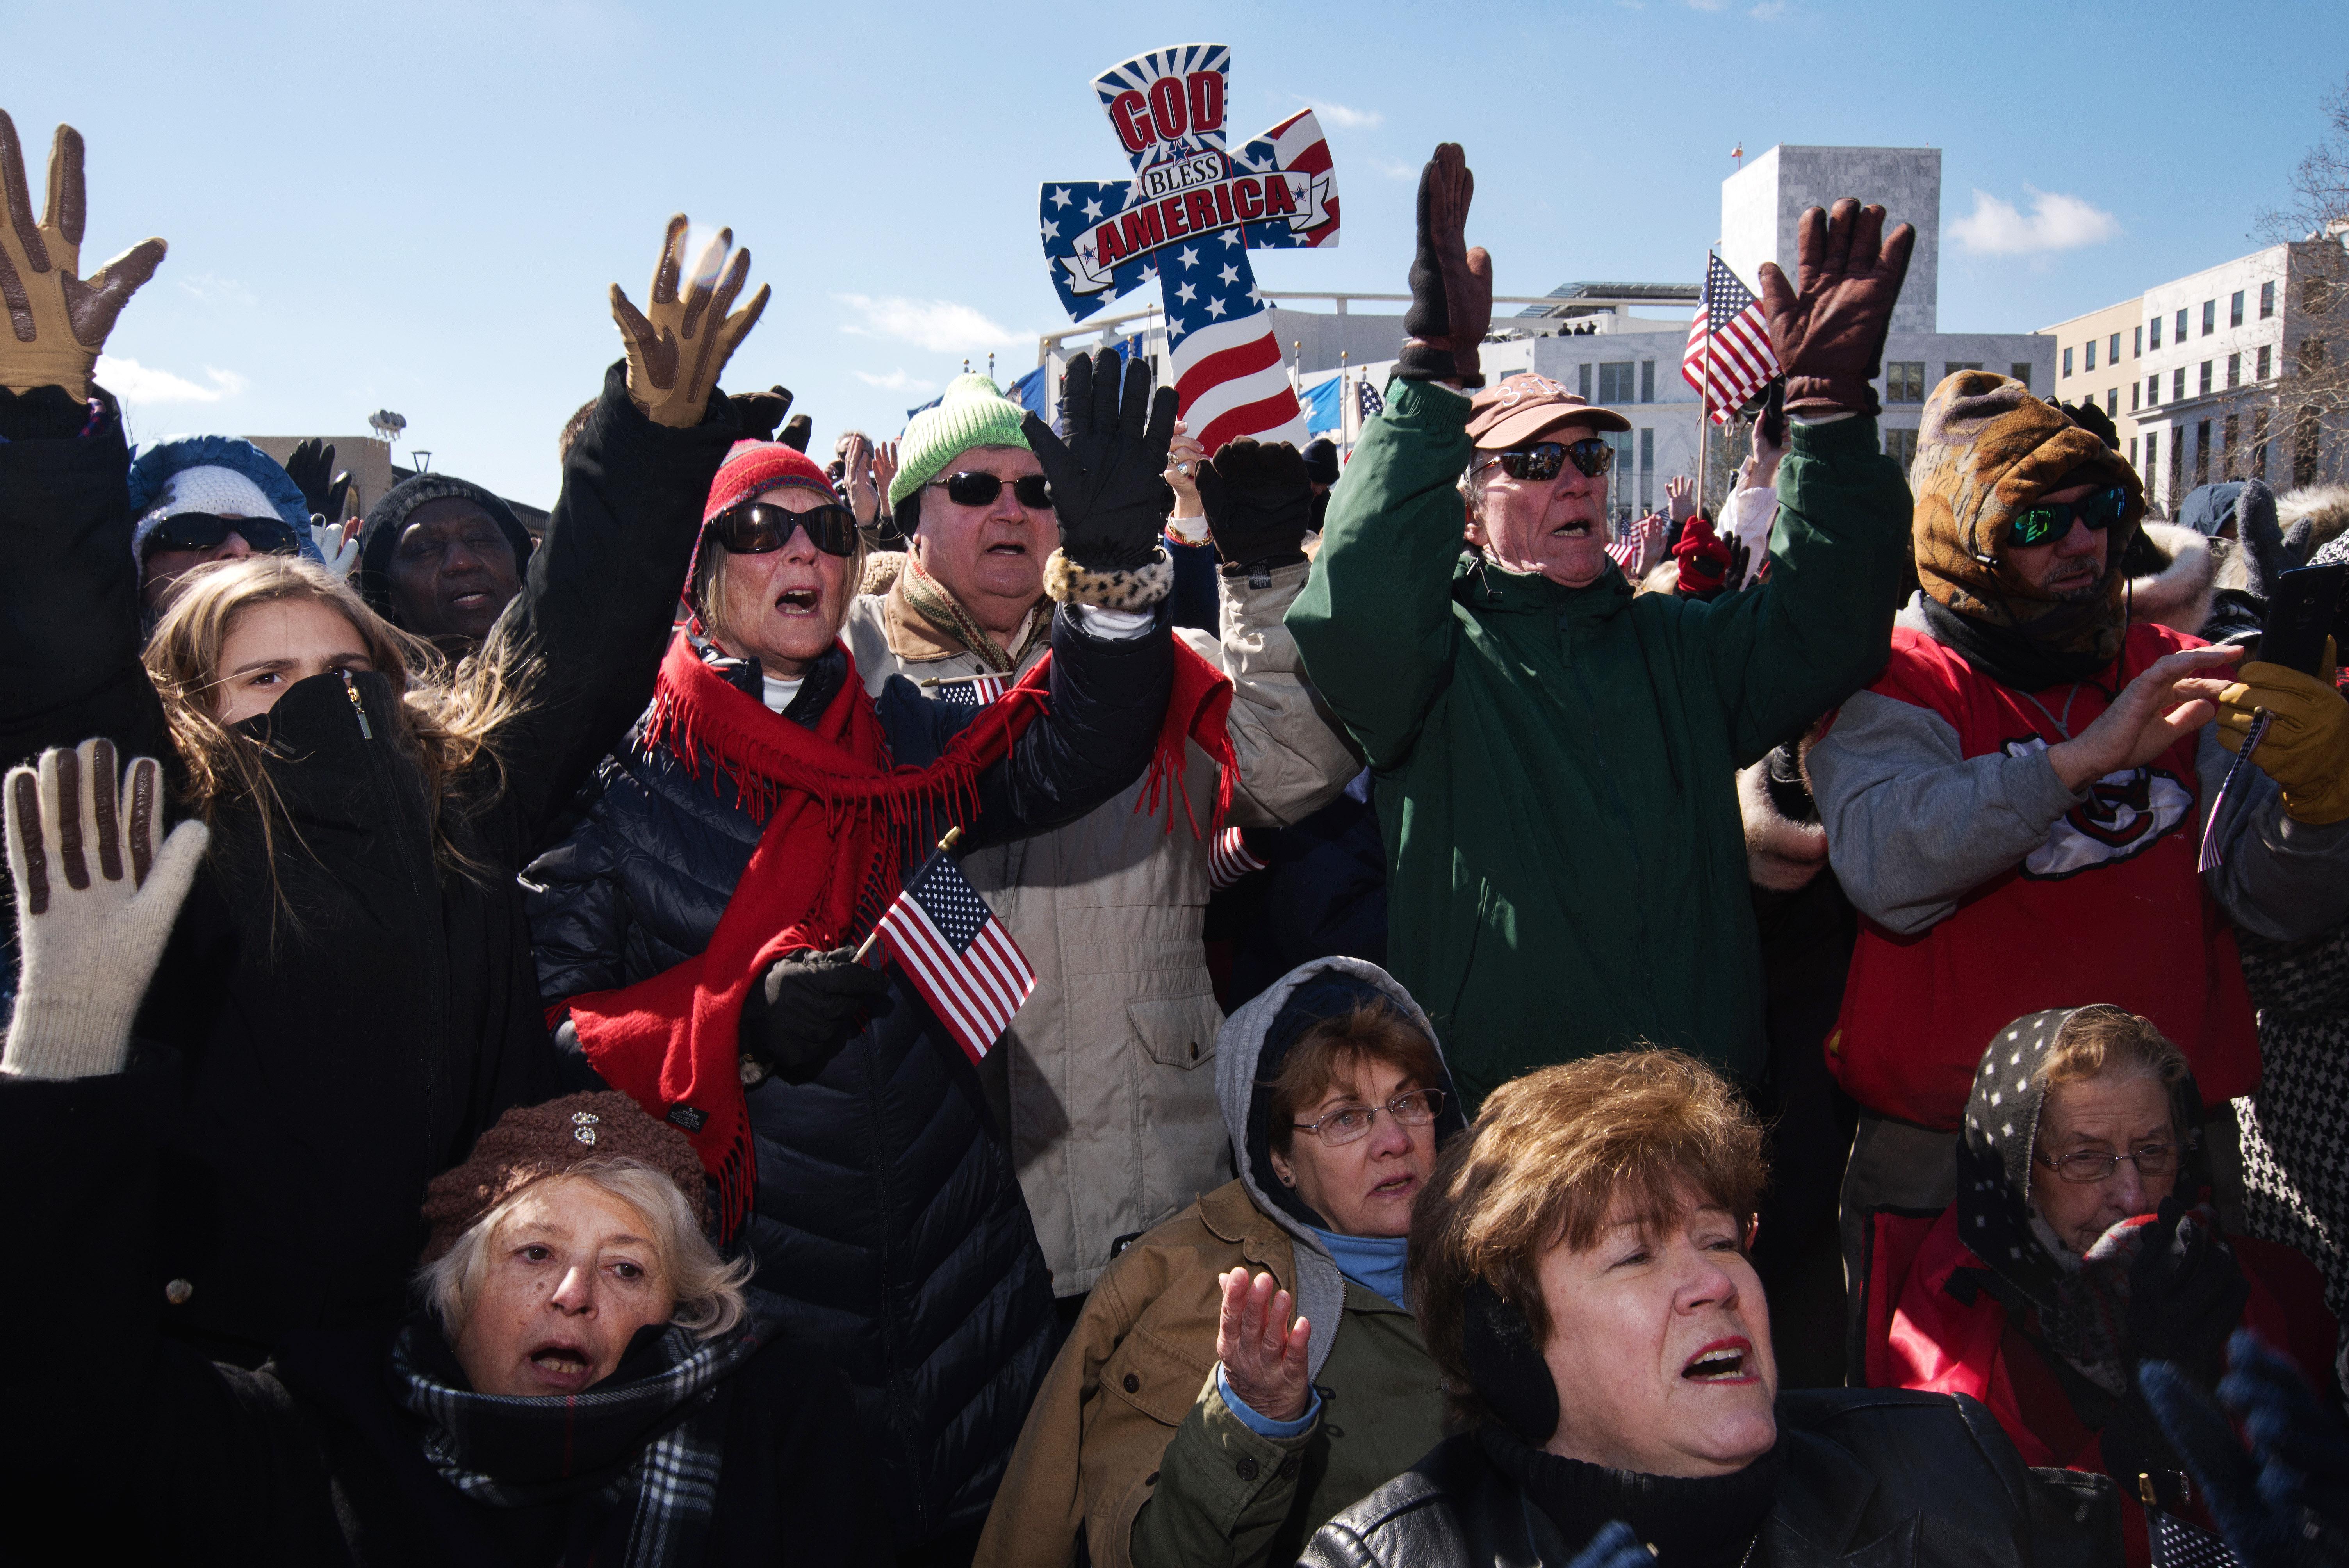 Evangelist Franklin Graham speaks to attendees during a rally in Atlanta on Feb. 10, 2016.